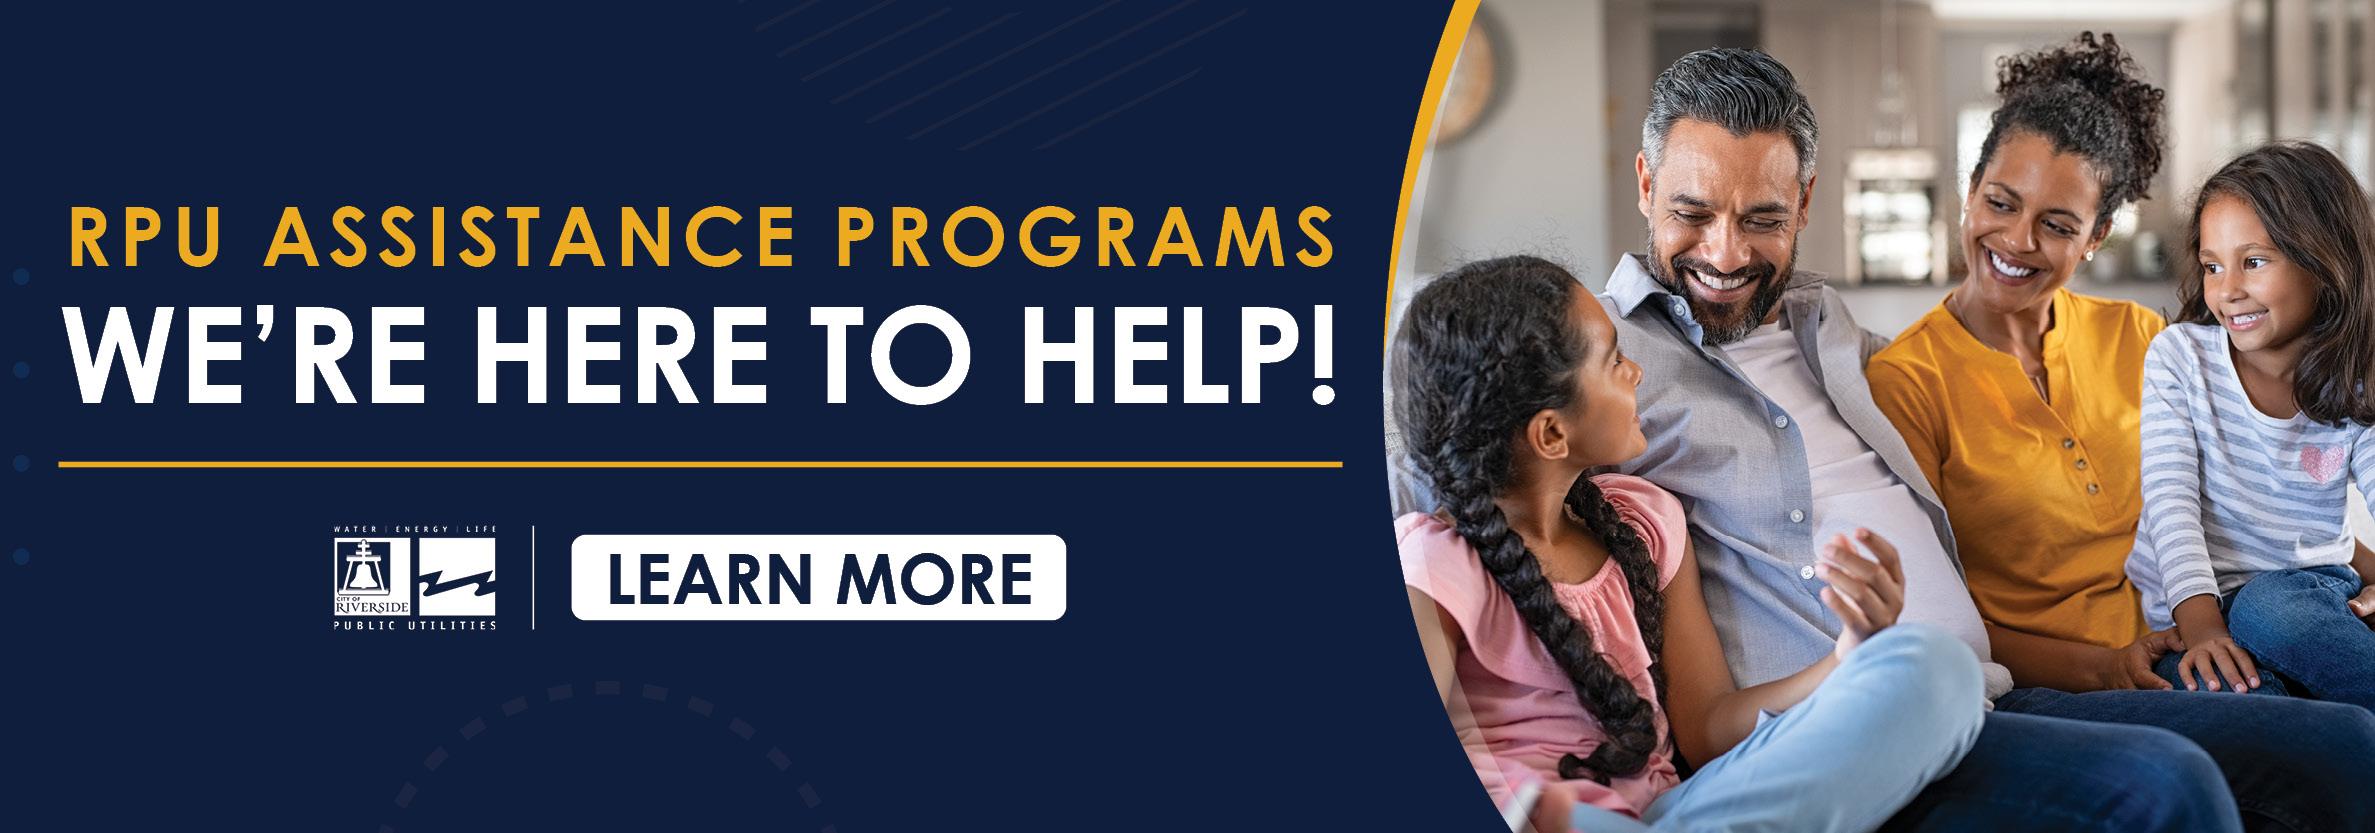 RPU Assistance Programs